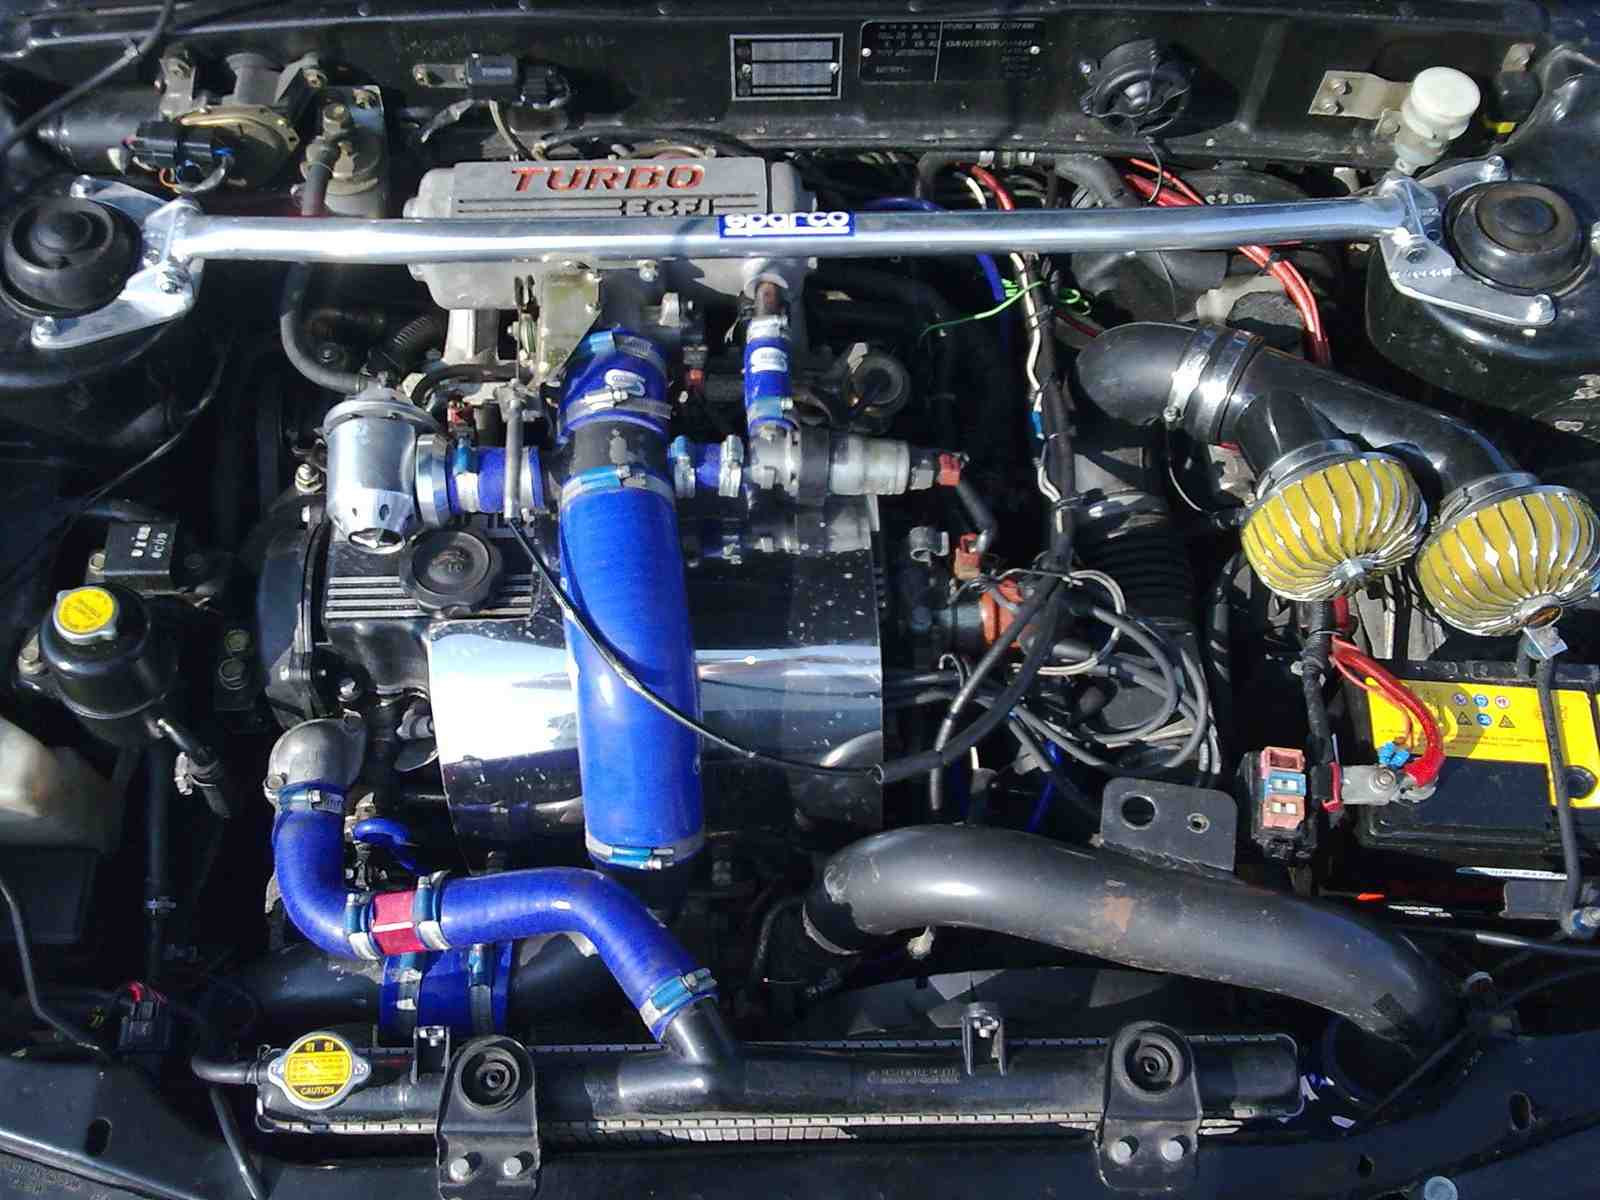 1990 1994 hyundai scoupe workshop repair service manual 1 016 rh pagelarge com Hyundai Genesis Coupe Hyundai Genesis Coupe